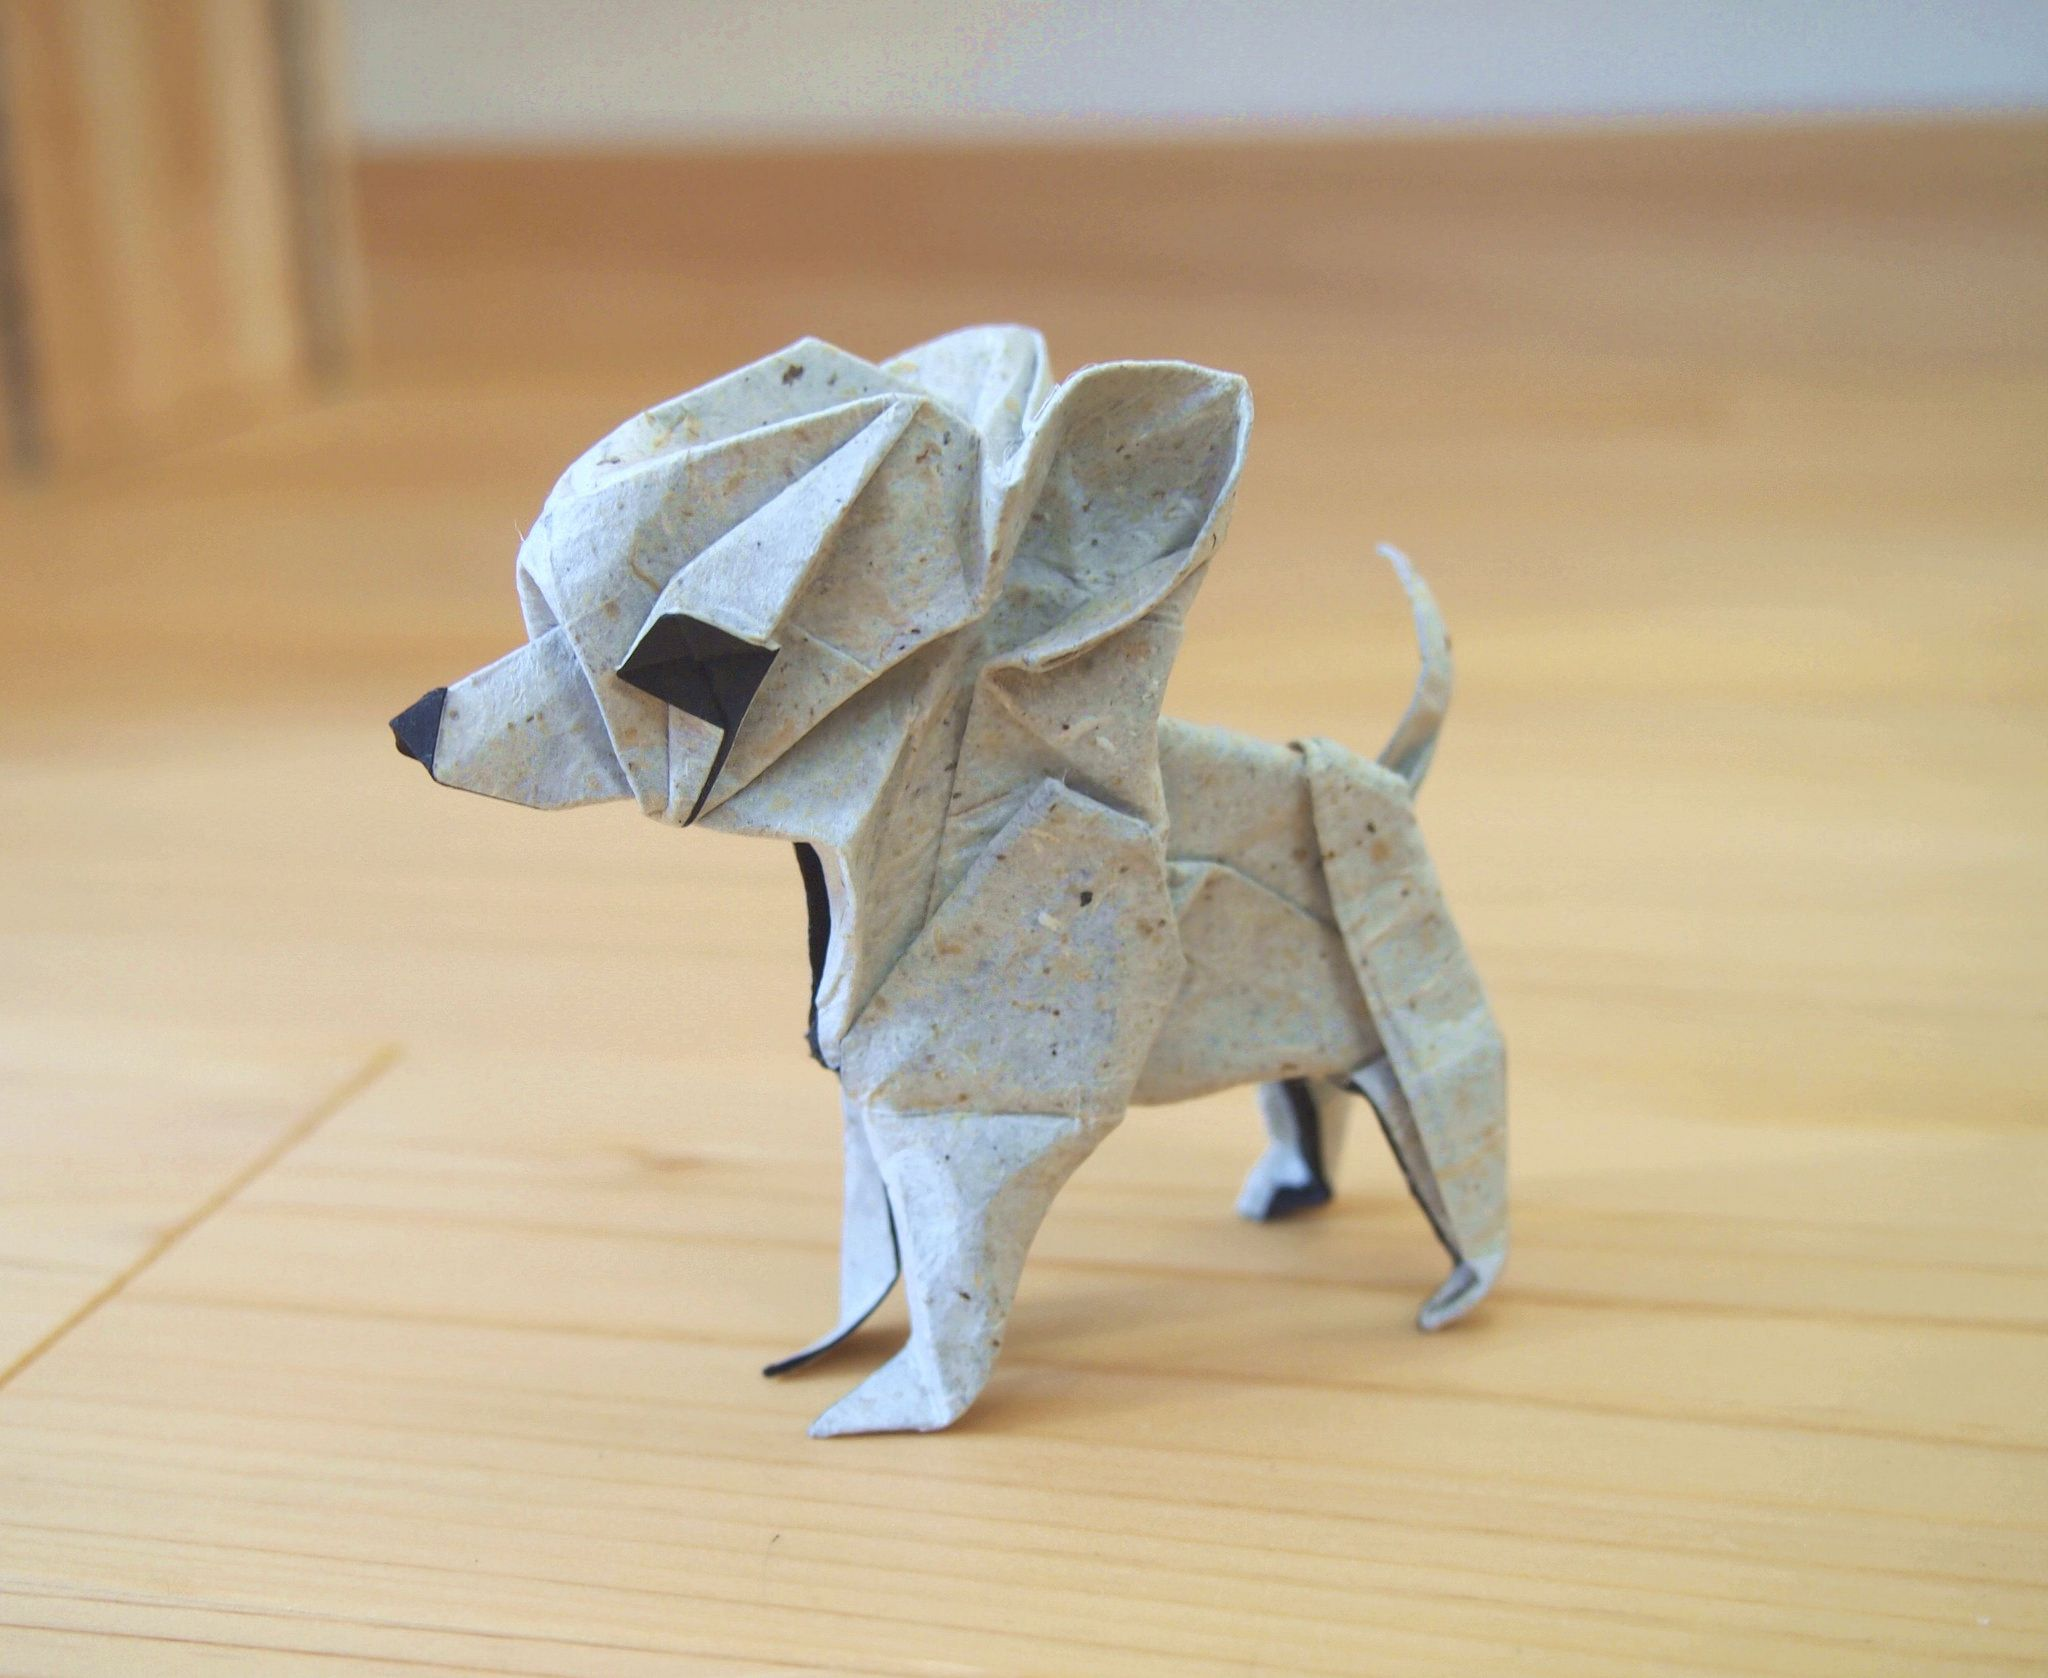 Origami Chihuahua Pinterest Animals Parrotdiagram By Barth Dunkan Ecorigami Designed And Folded Hiroaki Kobayashi Paper Crafts Art